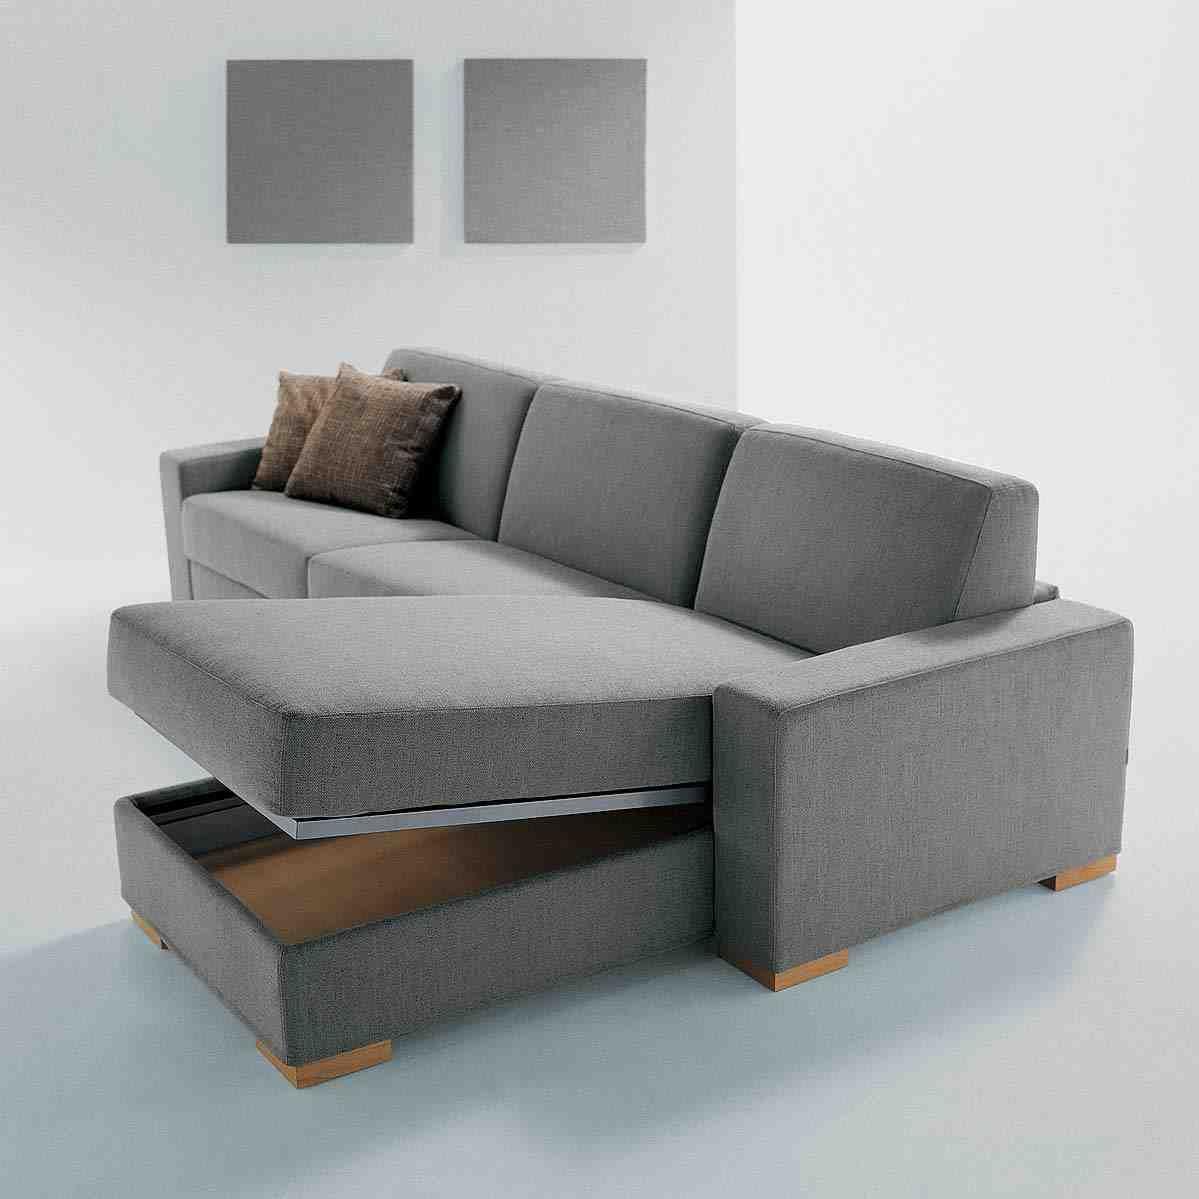 atherton home soho convertible futon sofa bed and lounger shabby chic uk manhattan